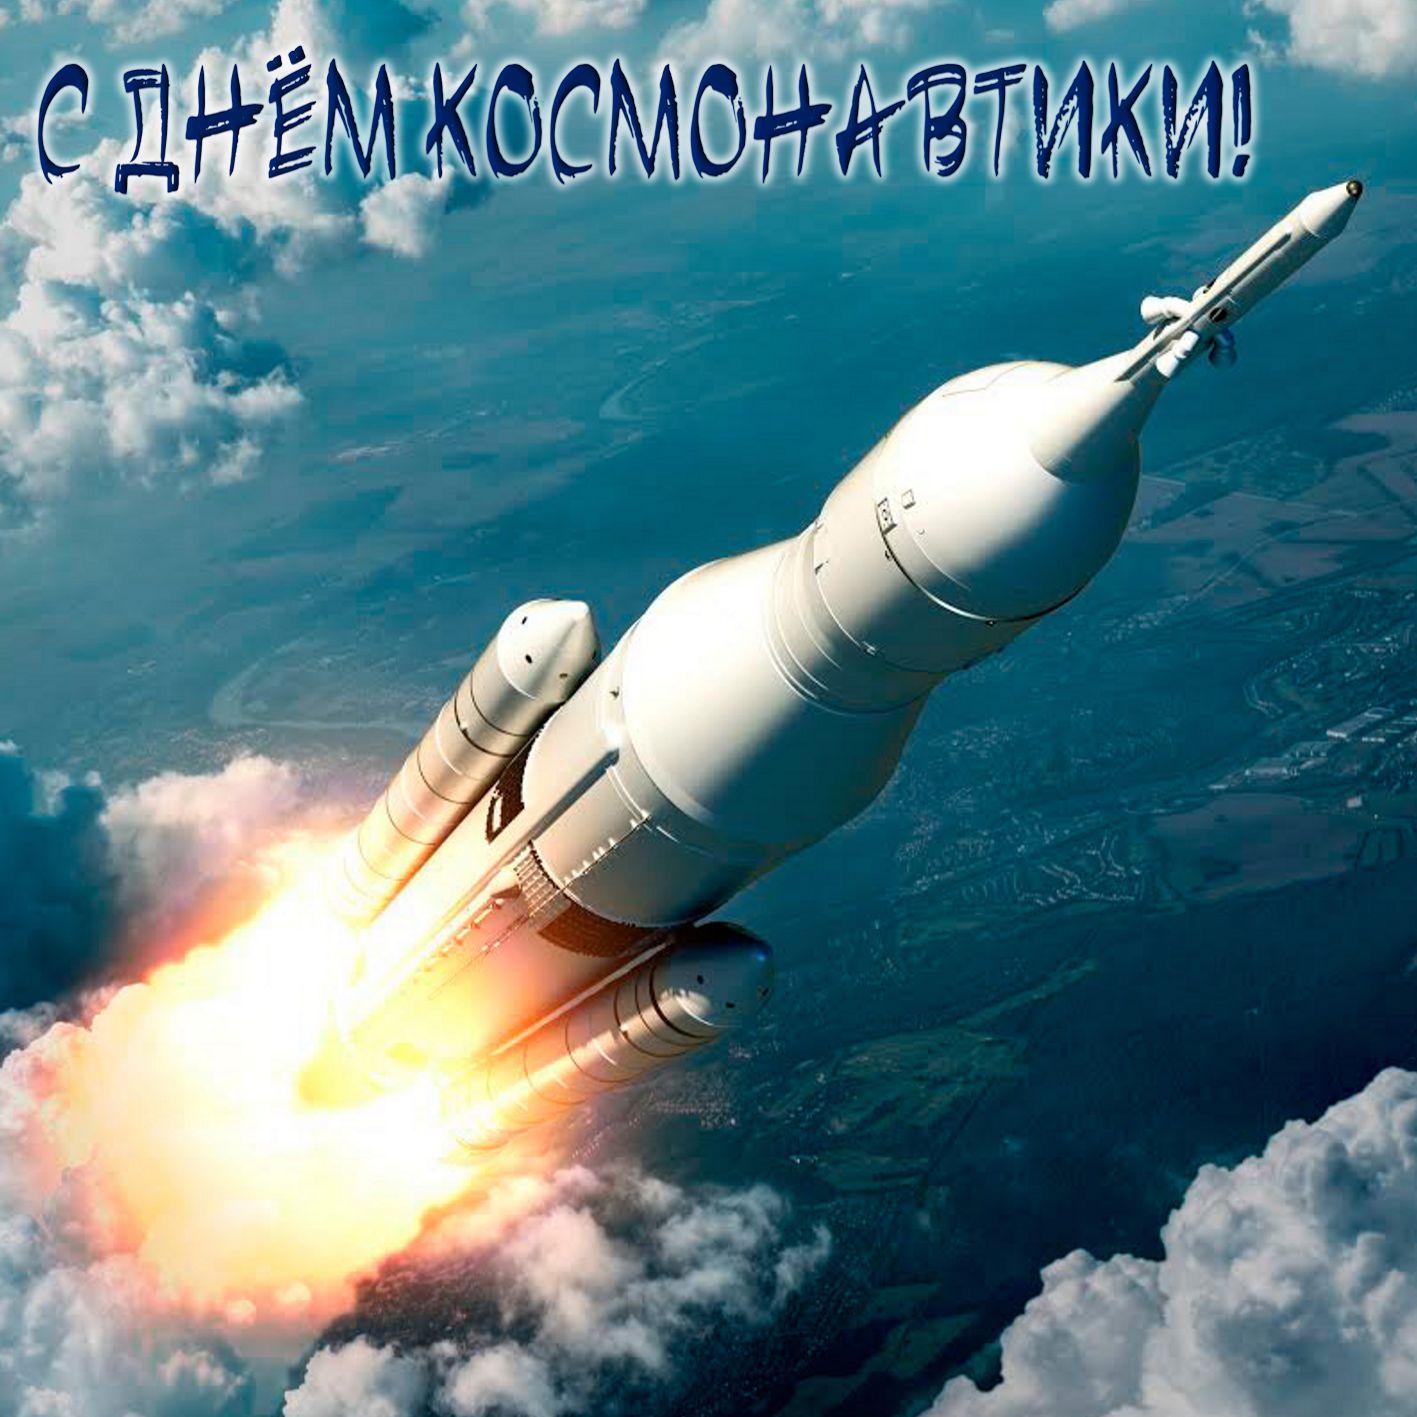 Взлетающая ракета на фоне Земли